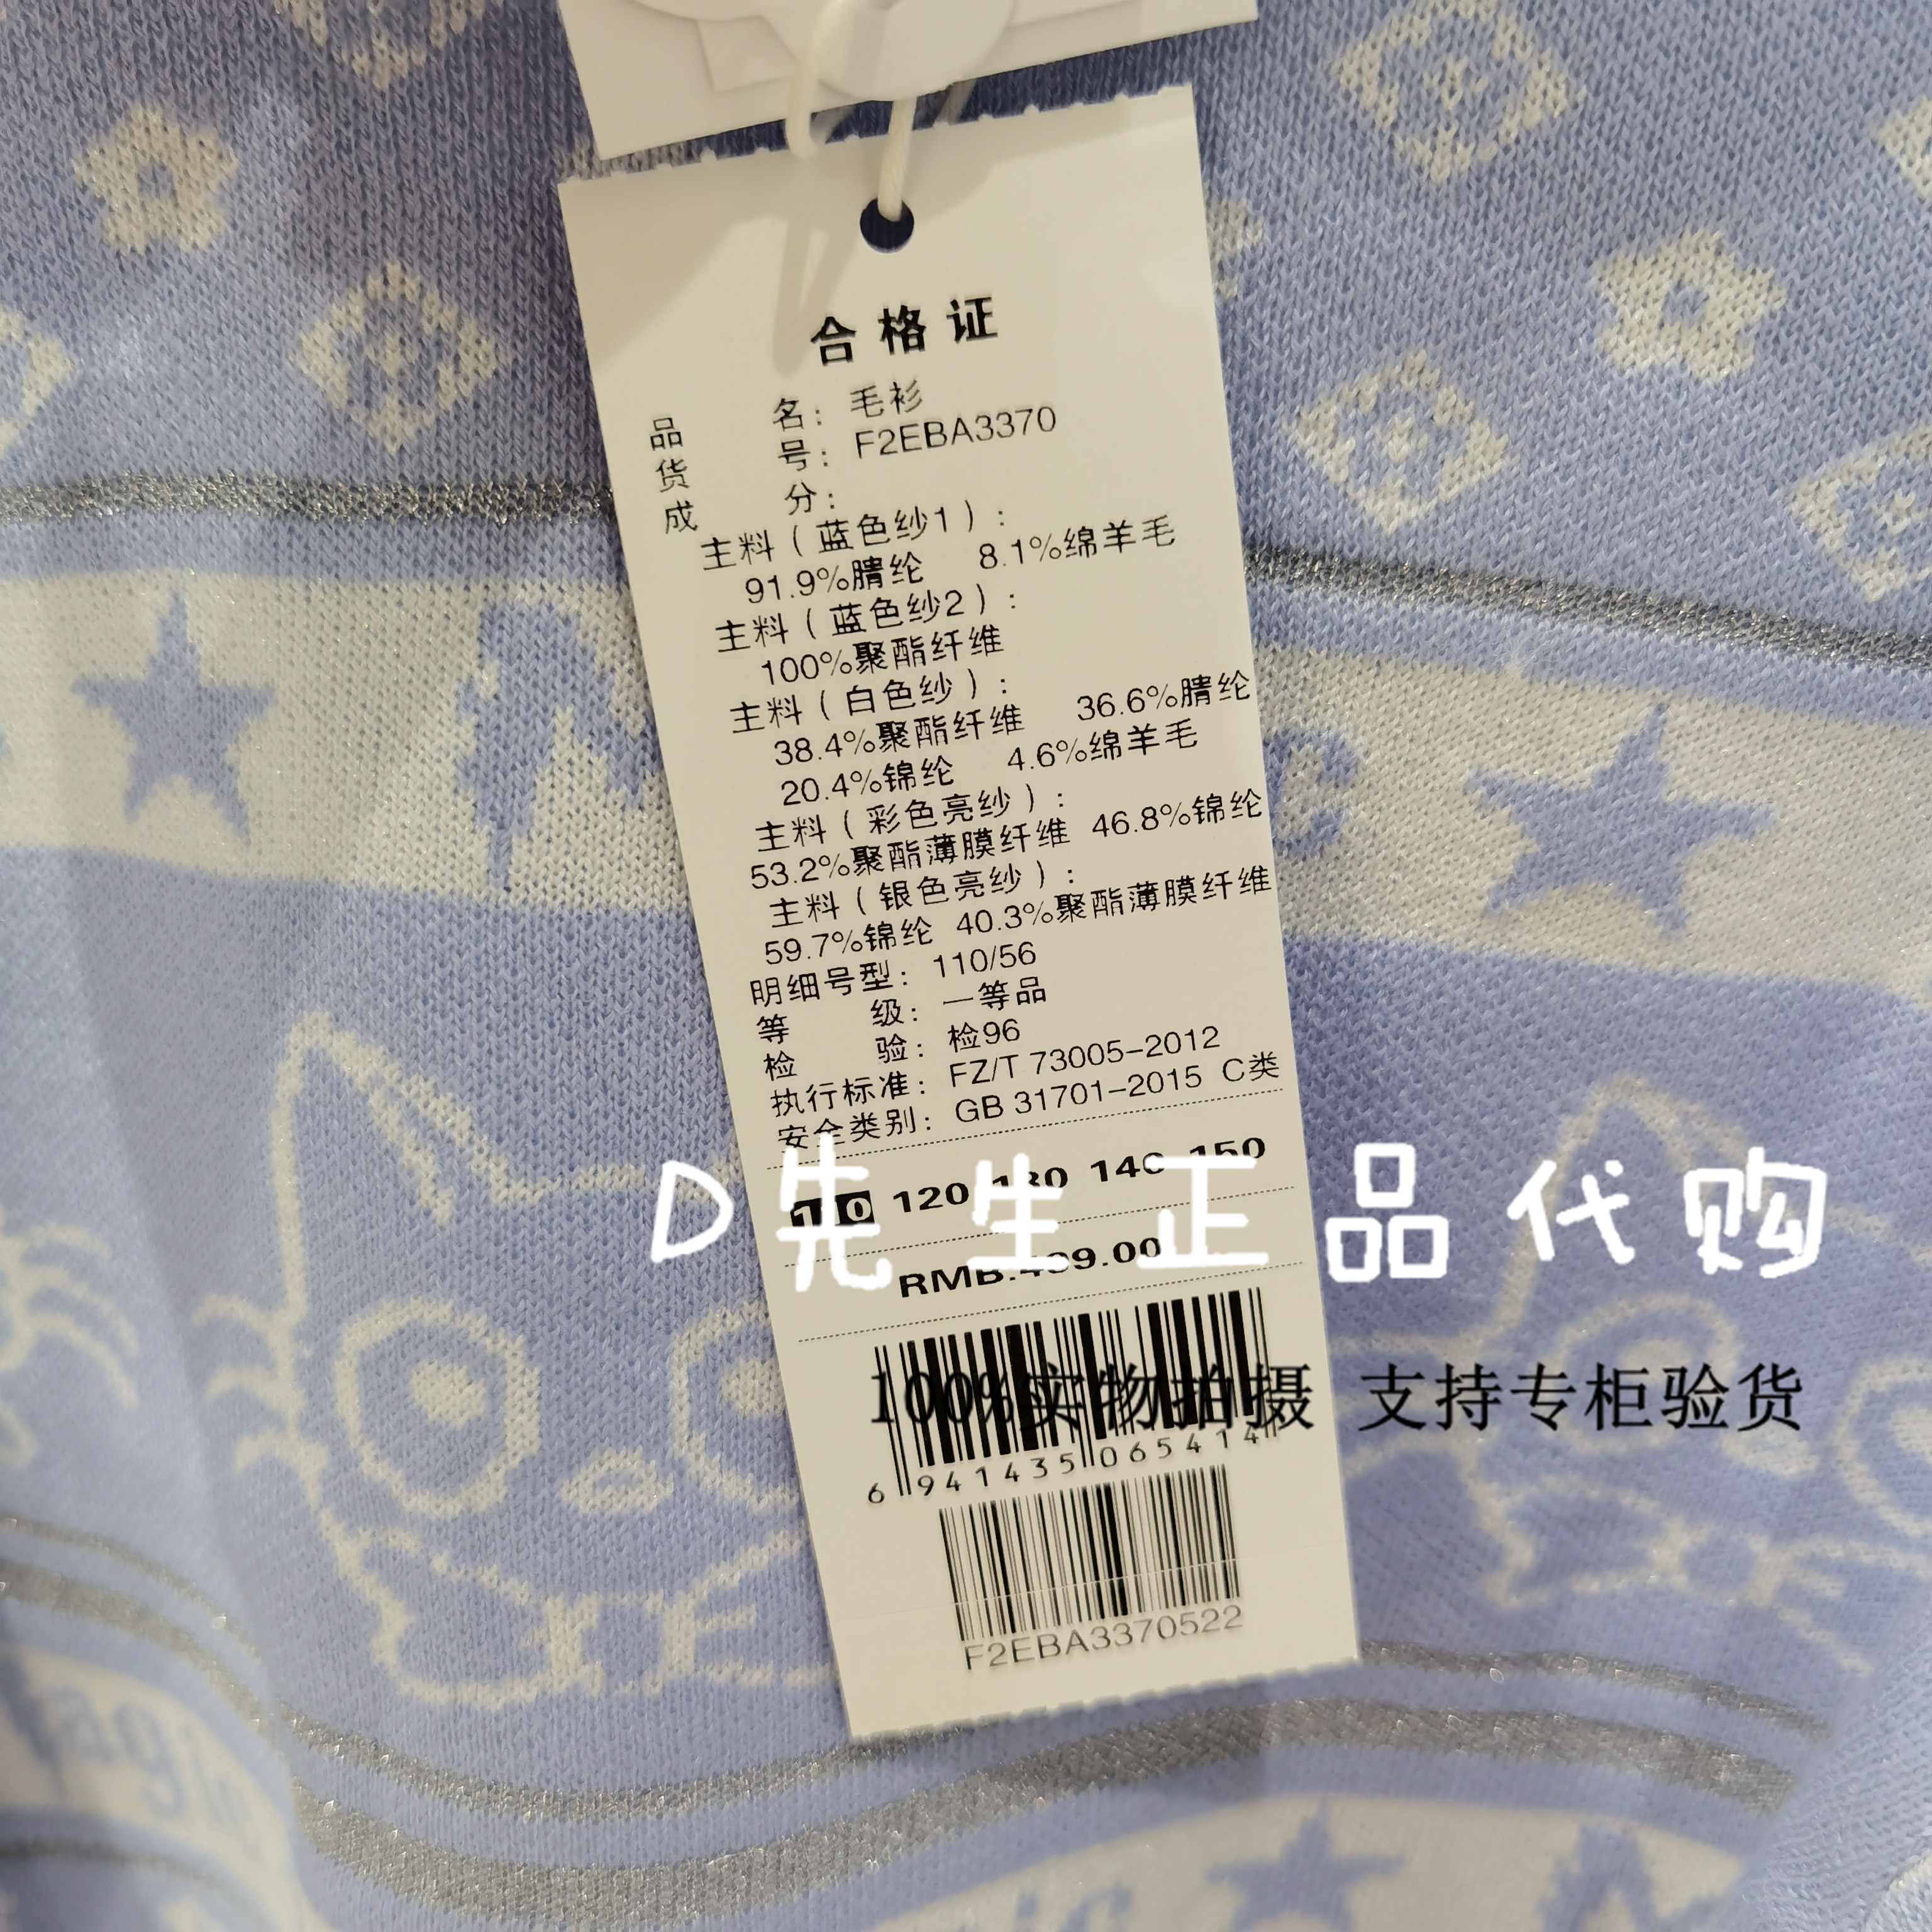 F2EBA3370 mini peace太平鸟童装2020秋装新款女童毛衫针织衫 499 - 图2